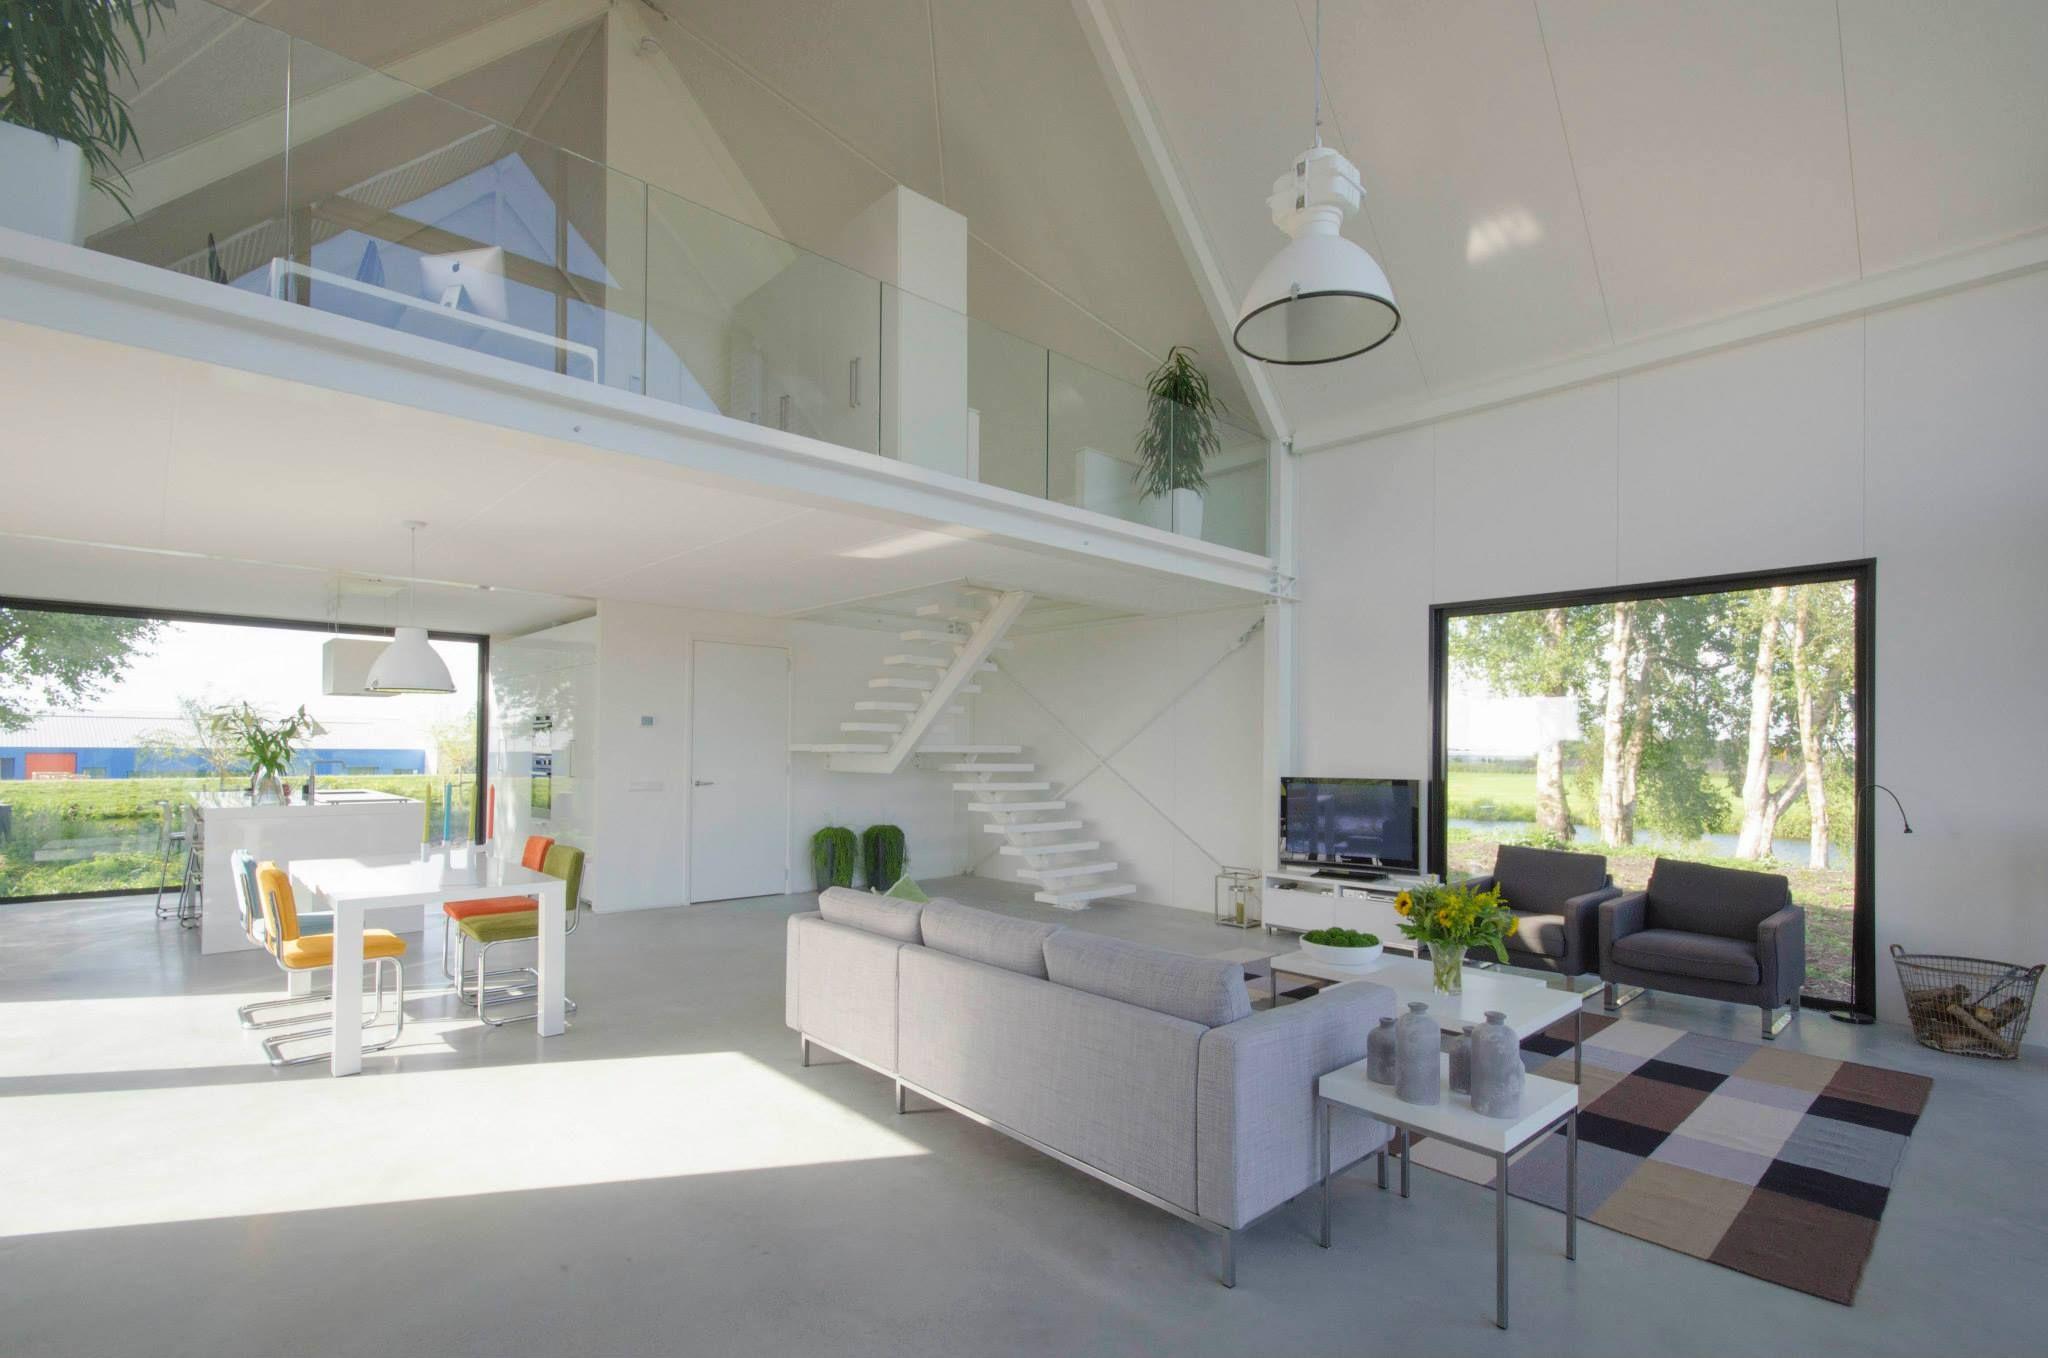 brede woonkamer, vide, glazen bordes, wit | Stair railing ...